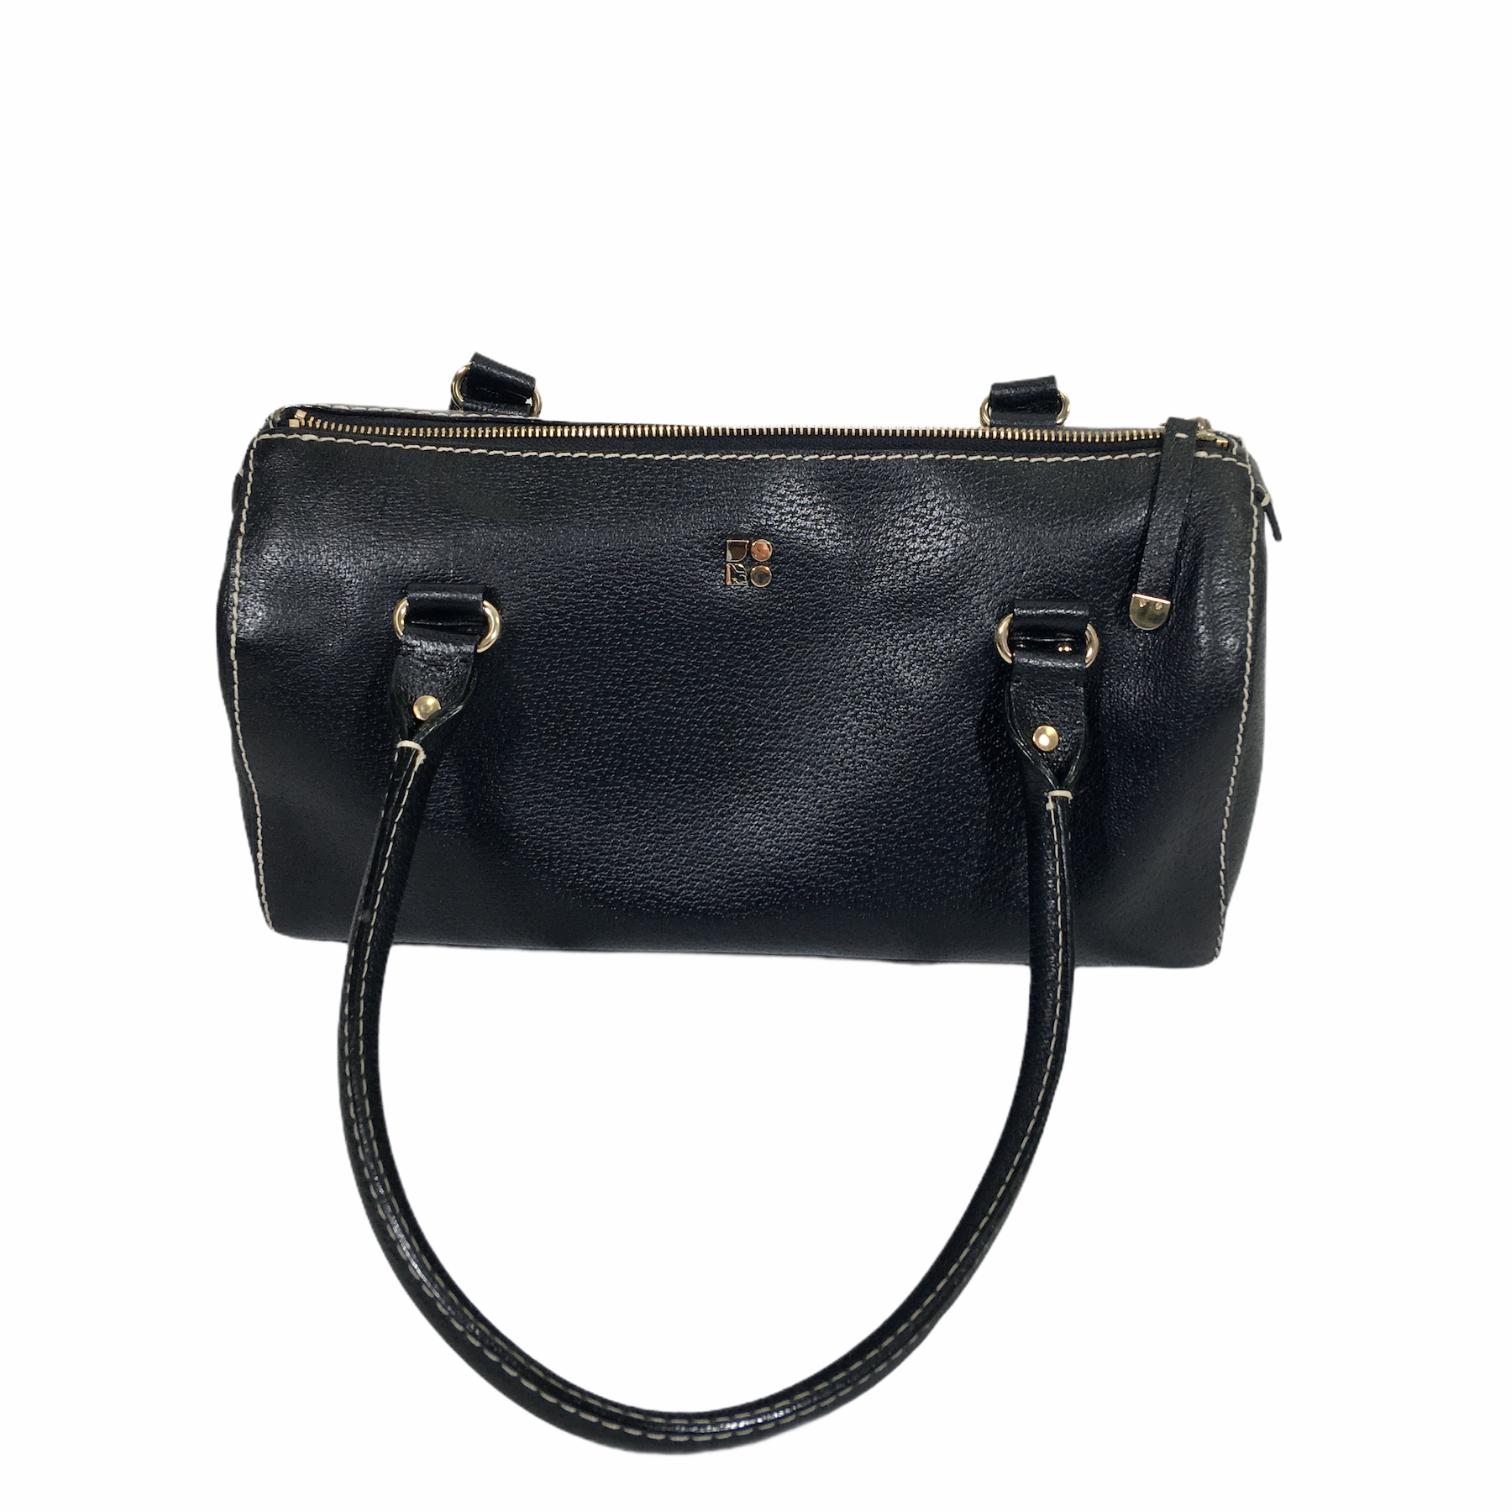 Kate Spade Leather Bag, Black, Size: Designer B serena westbury satchel